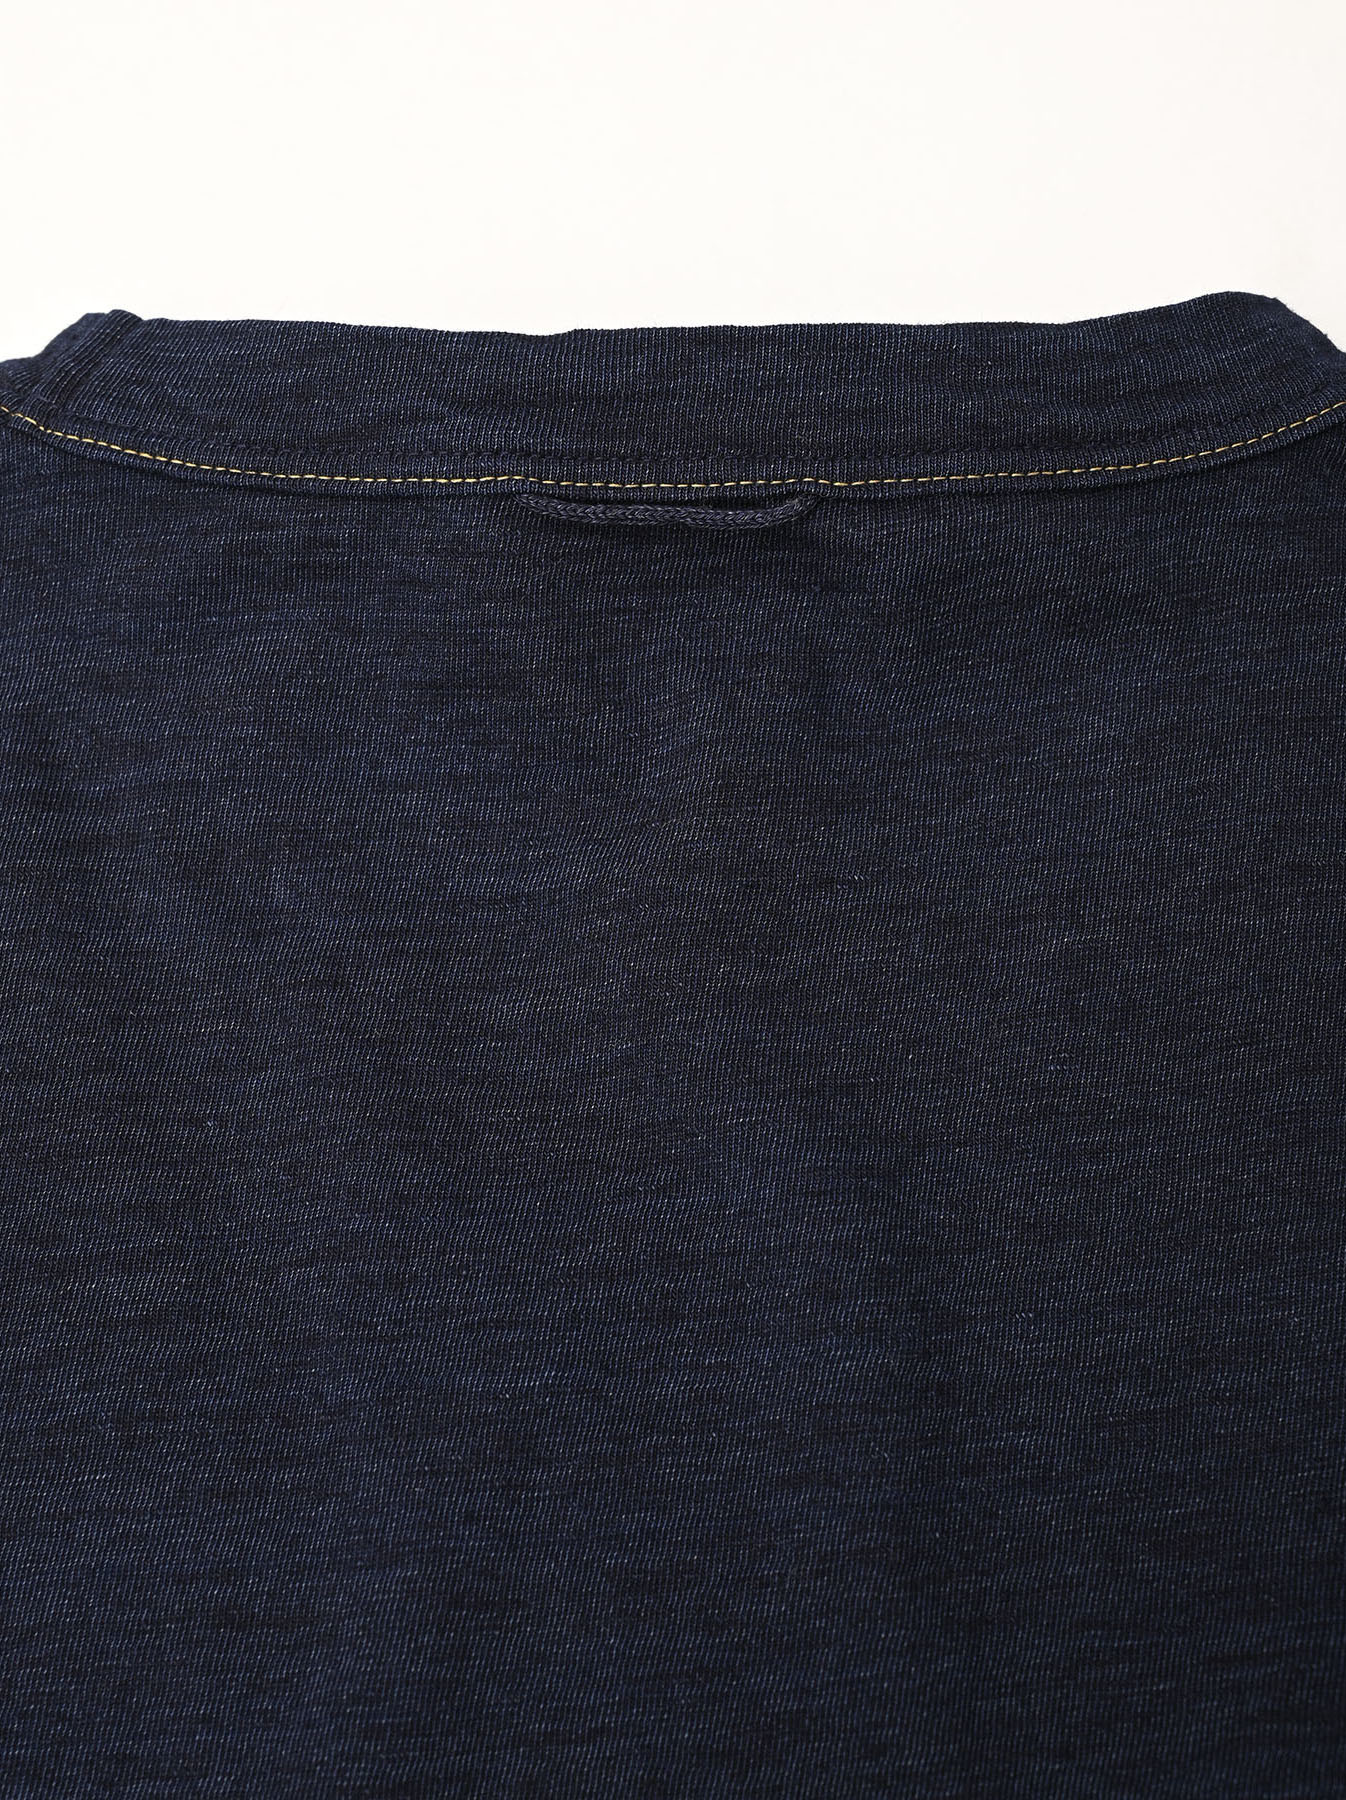 Indigo Zimbabwe 908 Ocean T-shirt-8